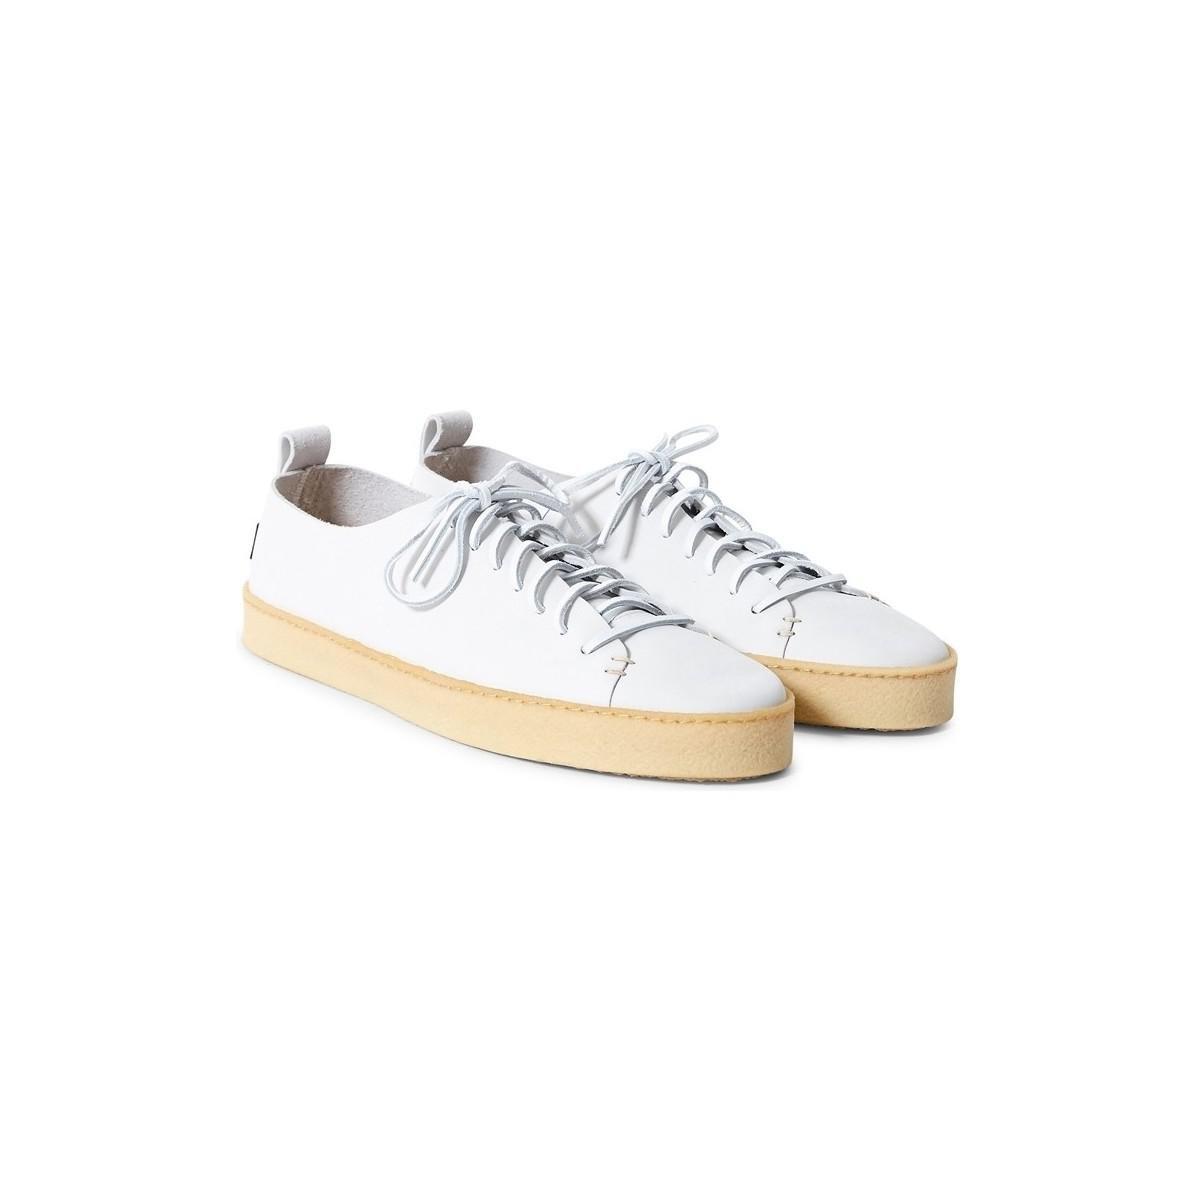 Yogi Rufus Nubuck Trainer White Men's Shoes (trainers) In White for Men